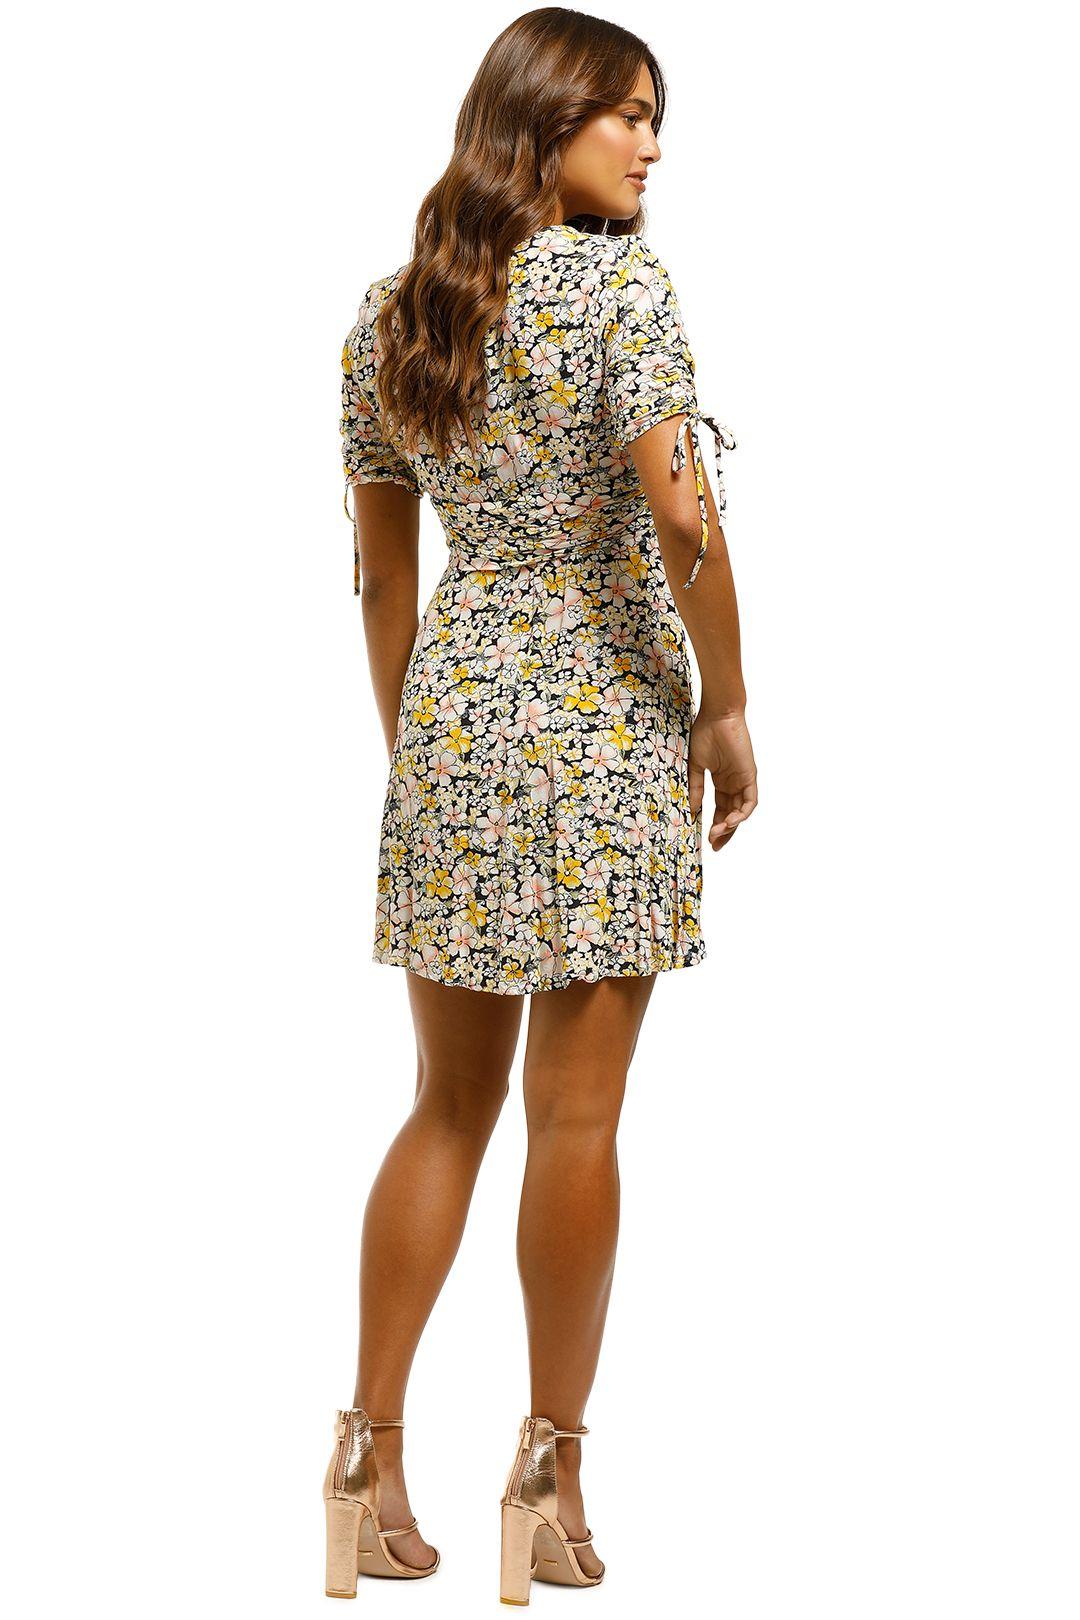 Rodeo Show - Billie Mini Dress - Floral - Back